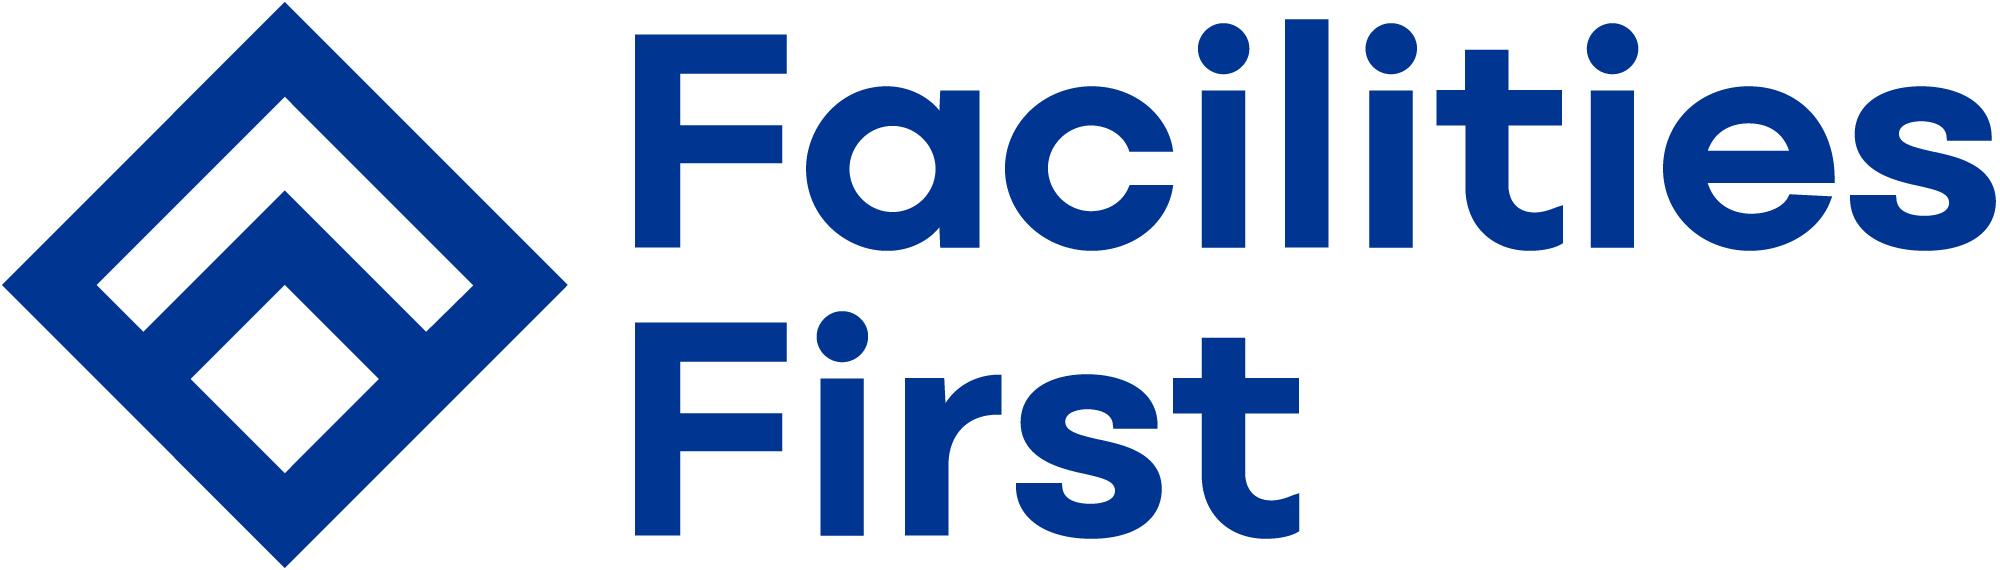 Facilities First Logo 2000px.jpg